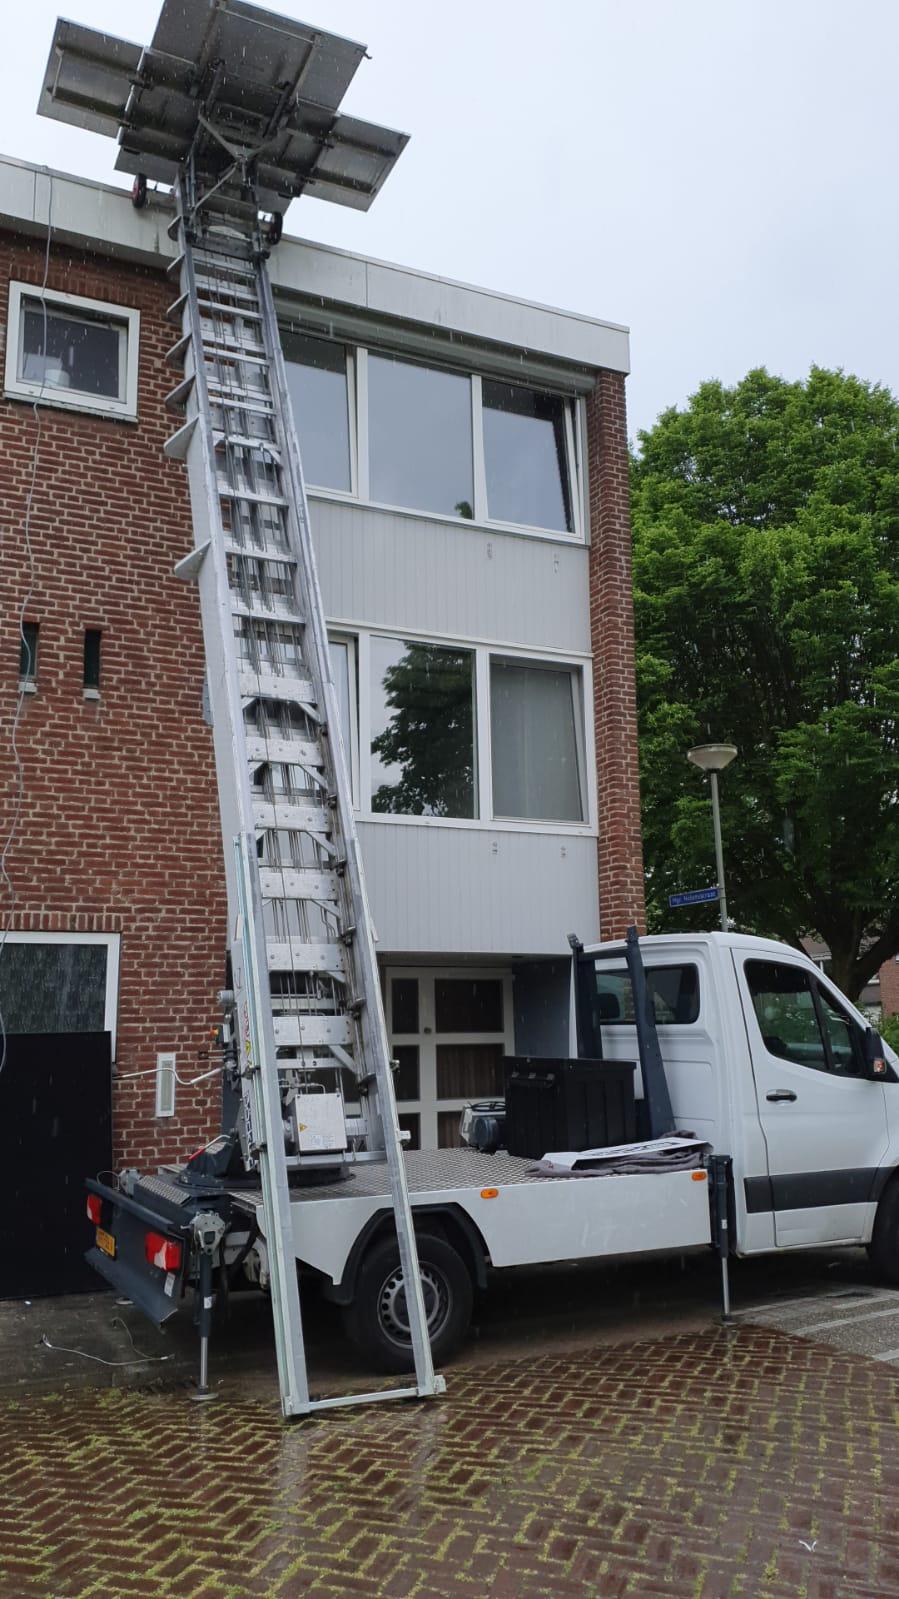 Verhuisliften specialist in Lelystad